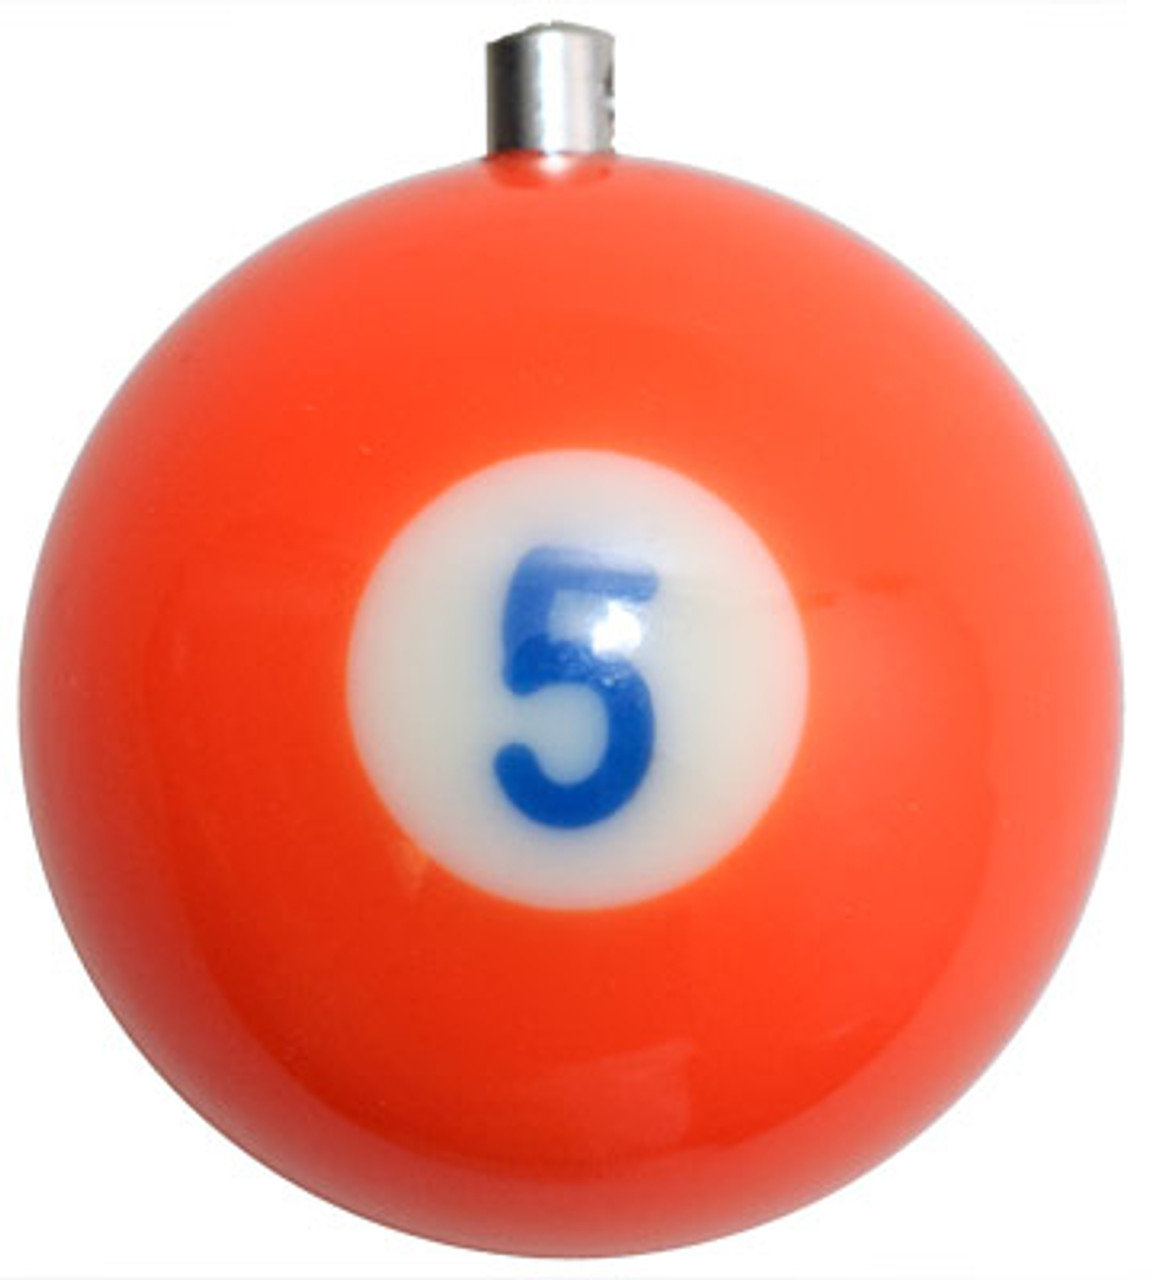 Billiard Ball Christmas Tree Ornaments - #5